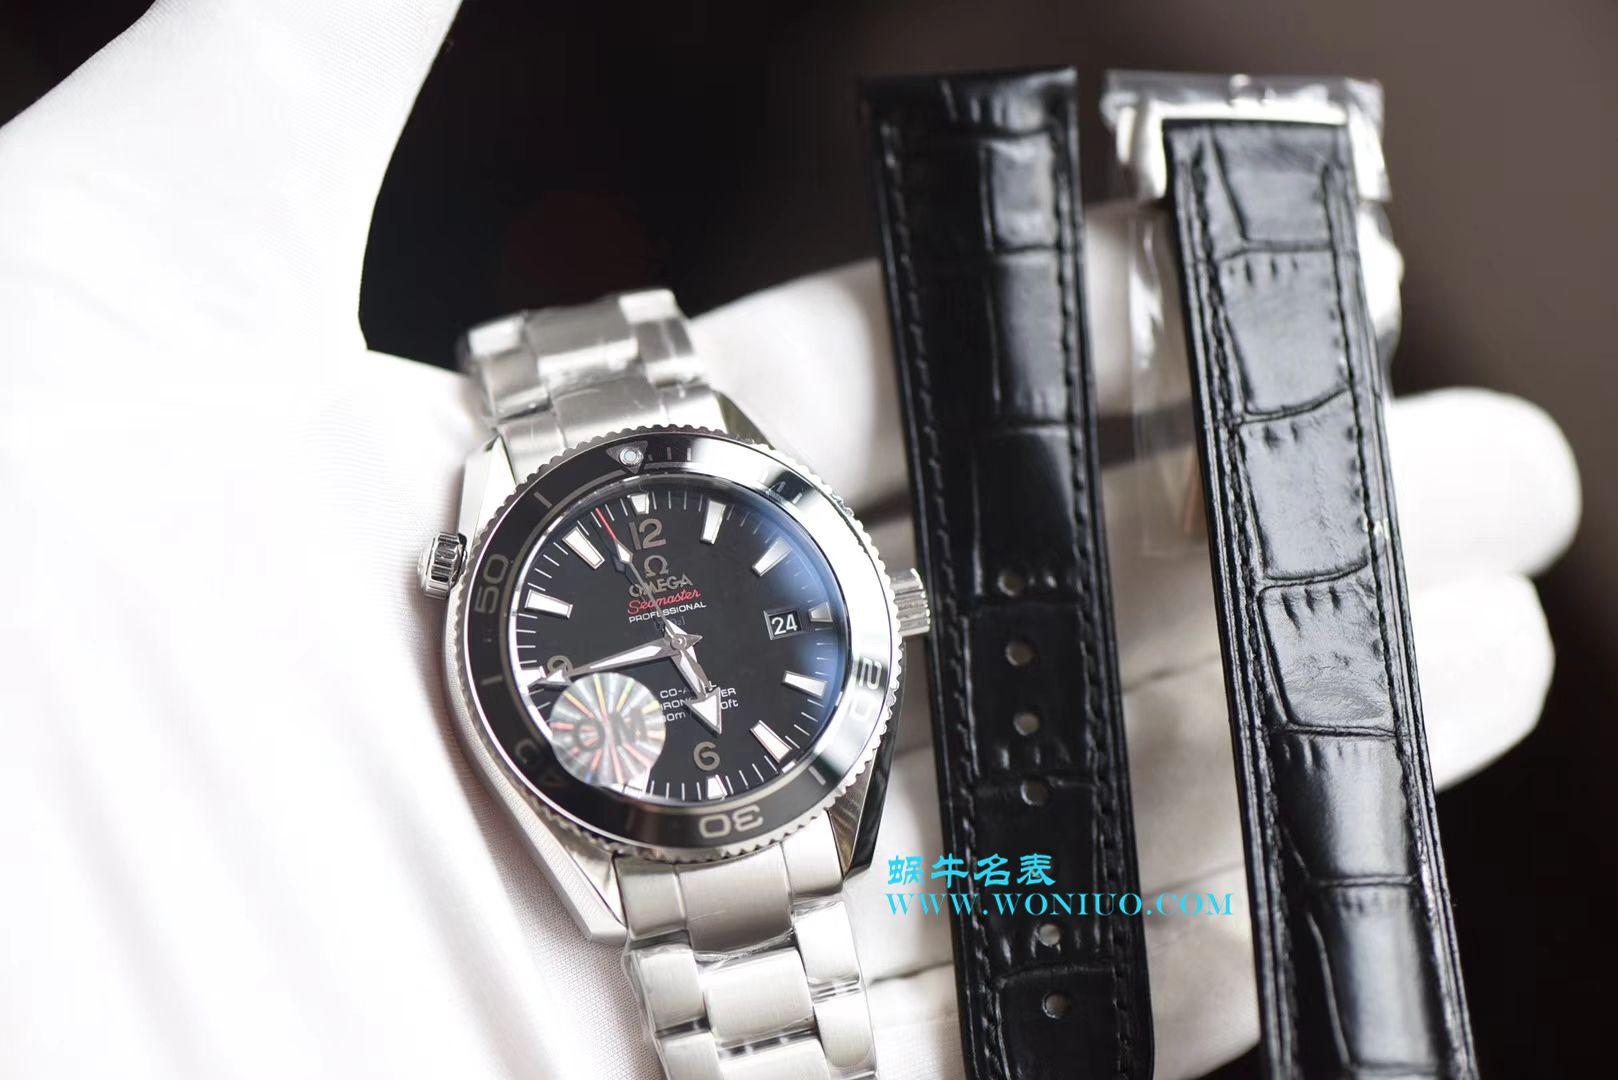 【OM一比一超A高仿手表】欧米茄PLANET OCEAN海马系列1948限量版腕表